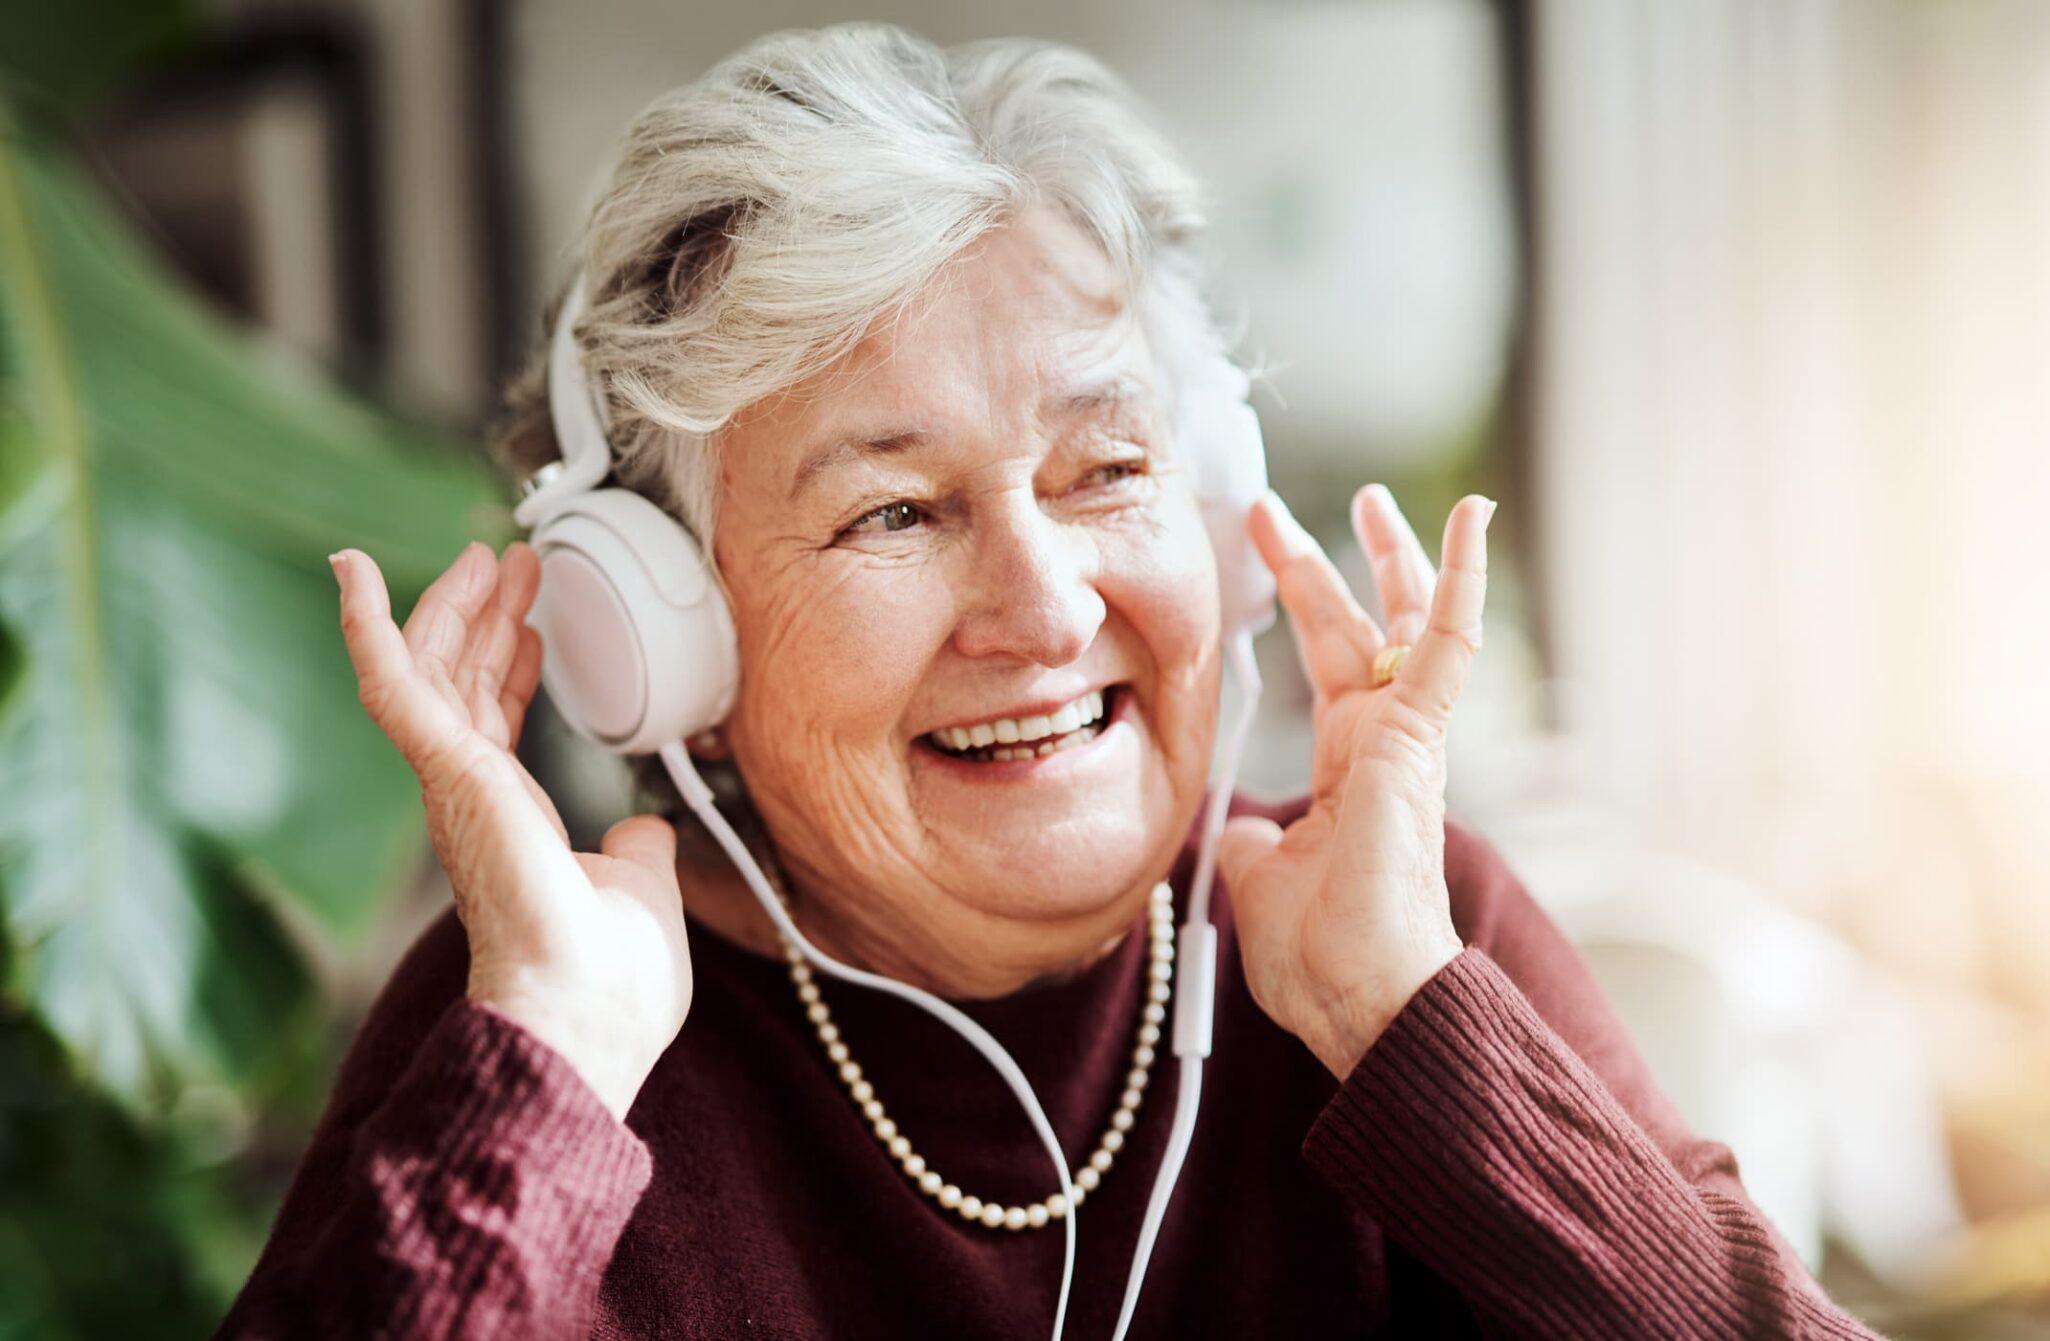 Smiling senior woman listening to music through headphones.